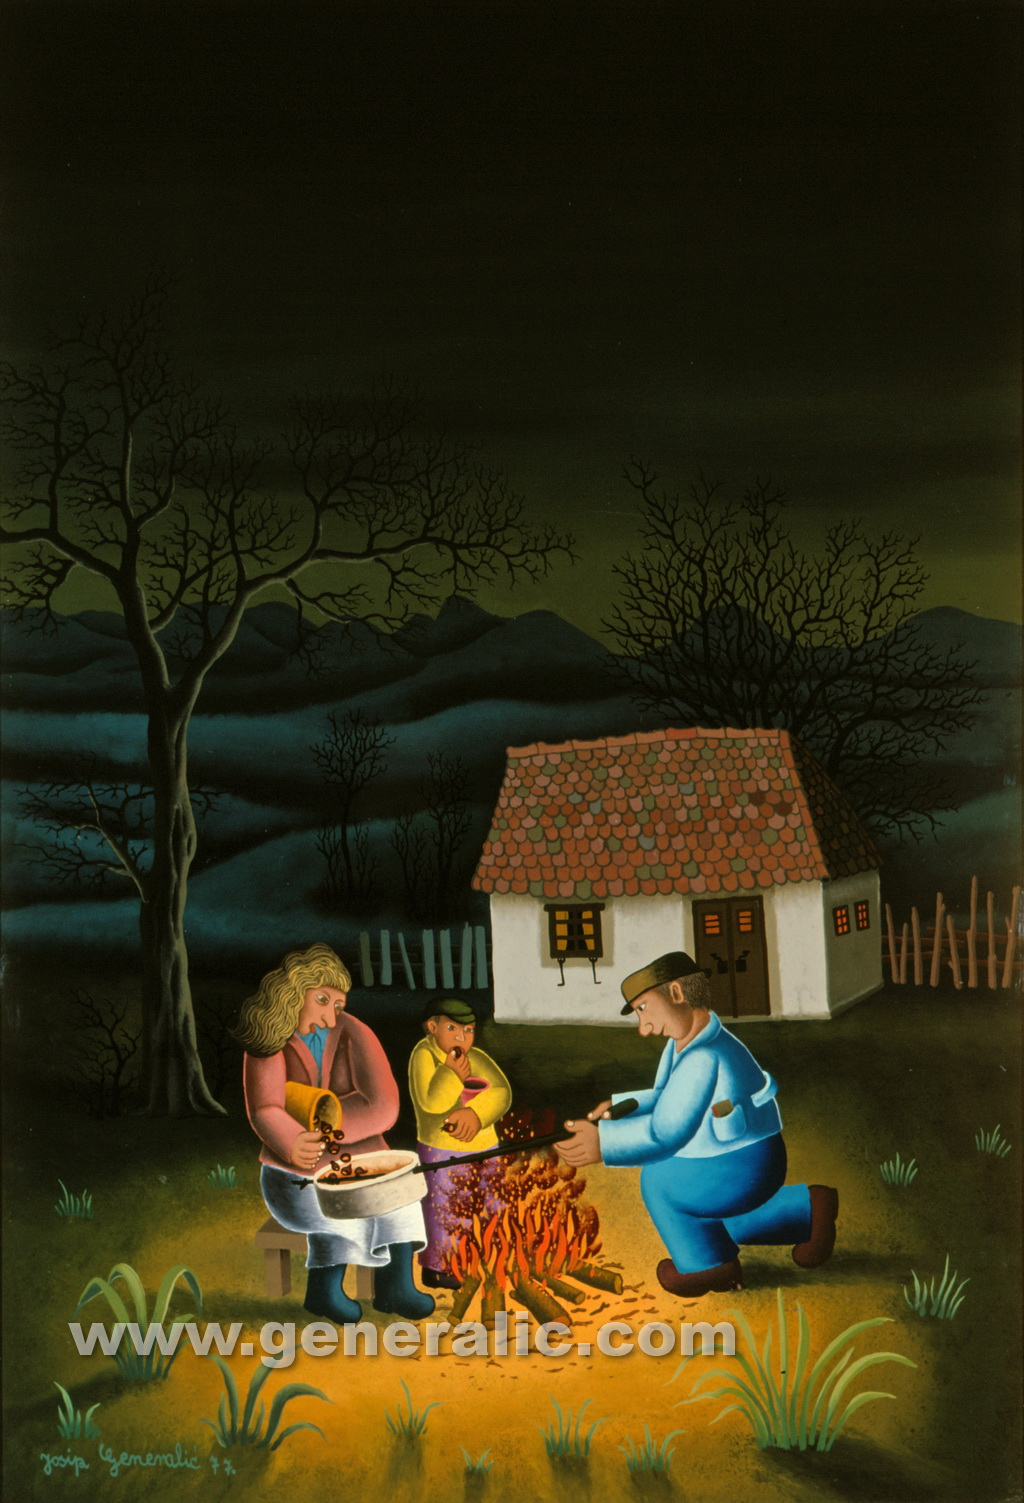 Josip Generalic, 1977, Eating chestnuts, oil on glass